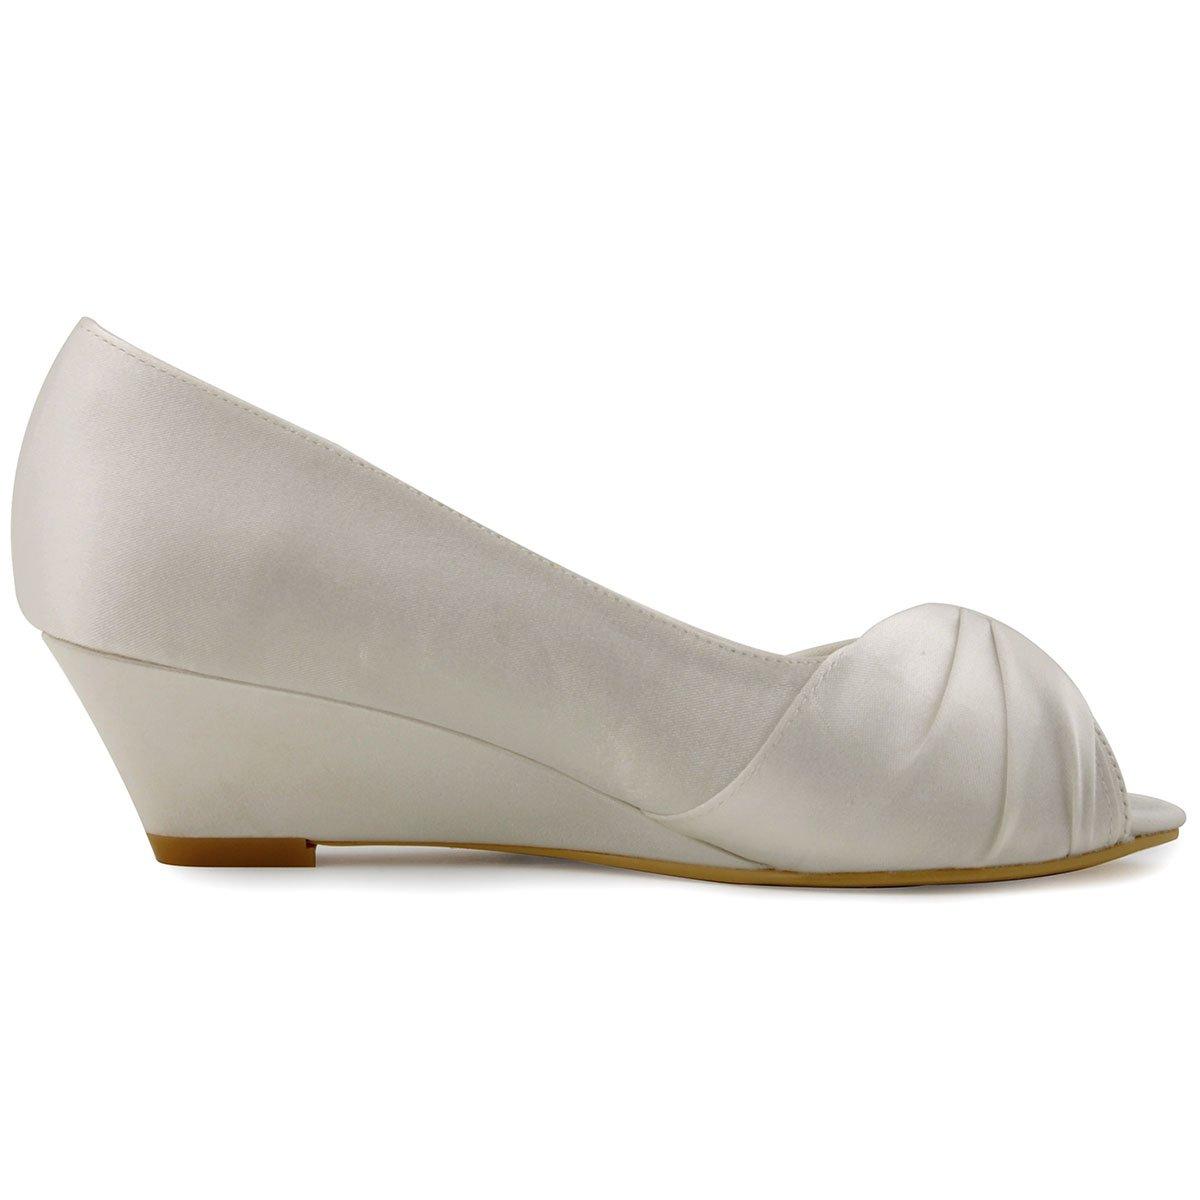 Elegantpark WP1403 Women Peep Toe Wedges Heel Rhinestones Satin Wedding  Bridal Shoes  Amazon.ca  Shoes   Handbags c56990b8b821